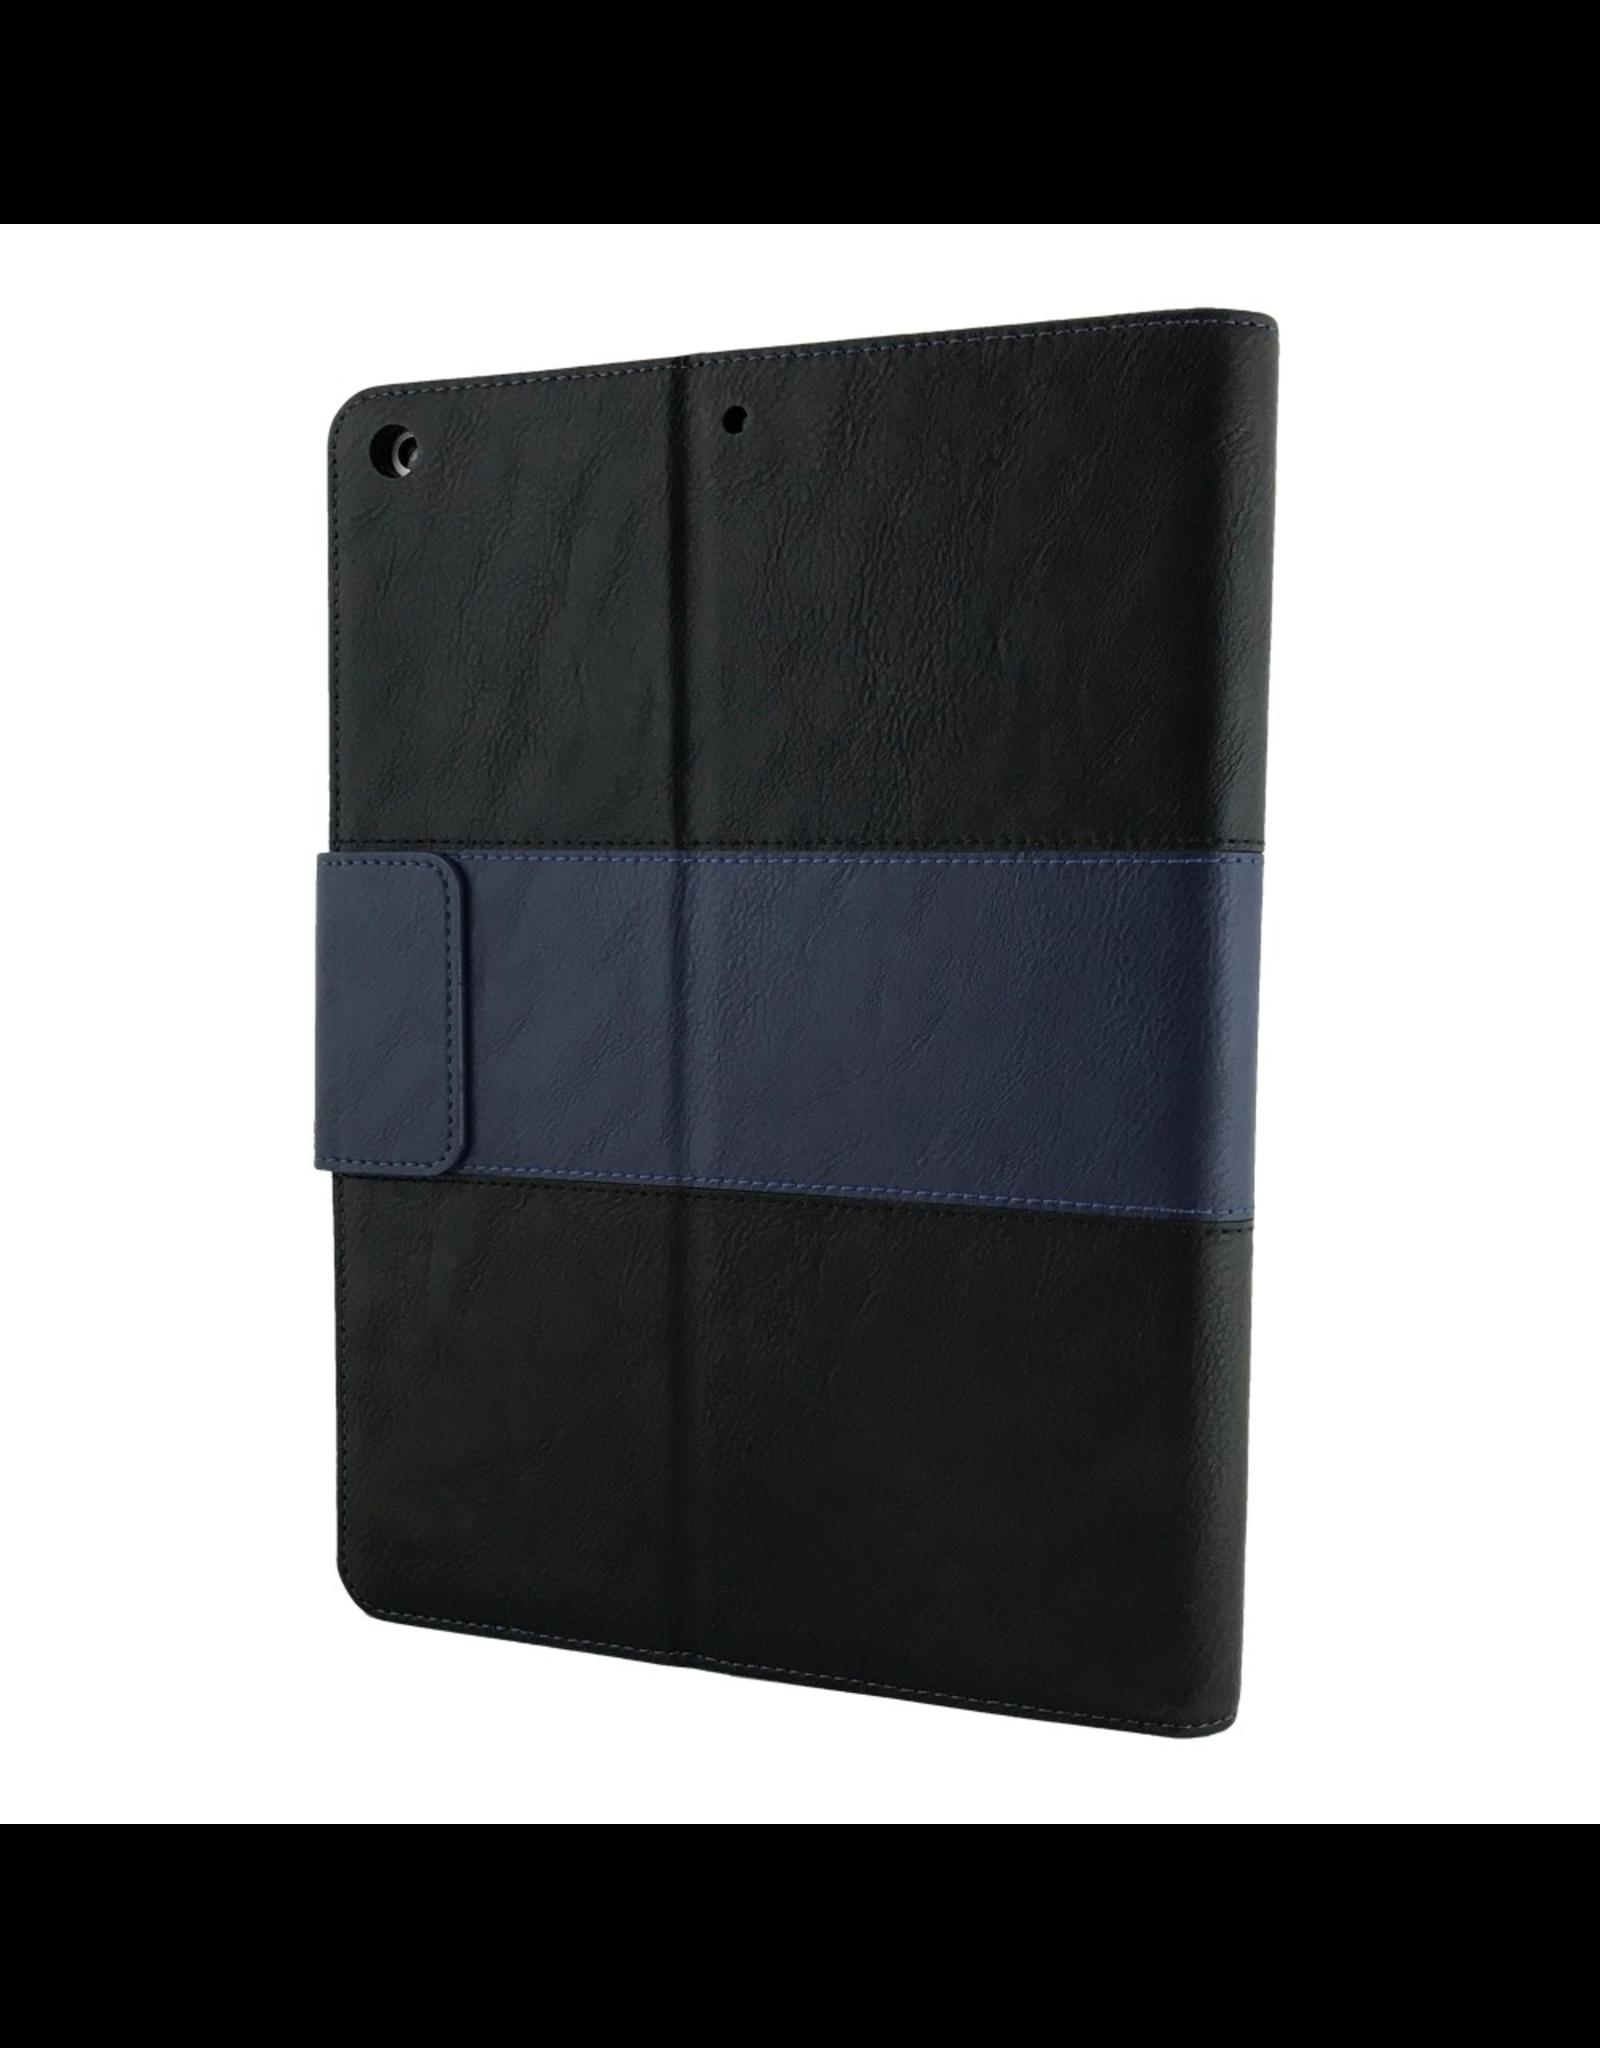 "NVS NVS Apollo Multiview Folio for iPad 10.2"" - Black/Blue"